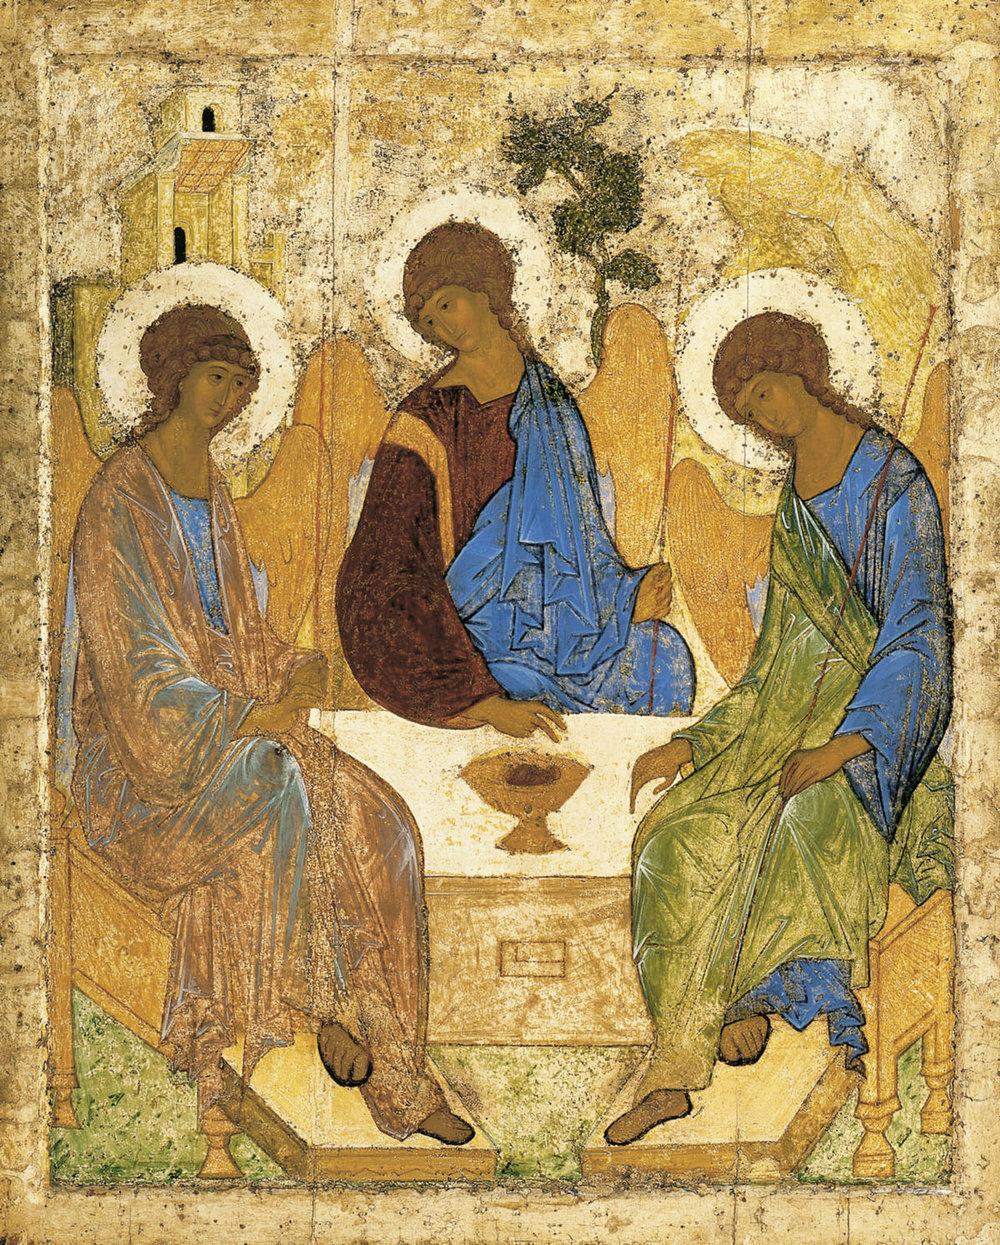 1200px-Angelsatmamre-trinity-rublev-1410.jpg